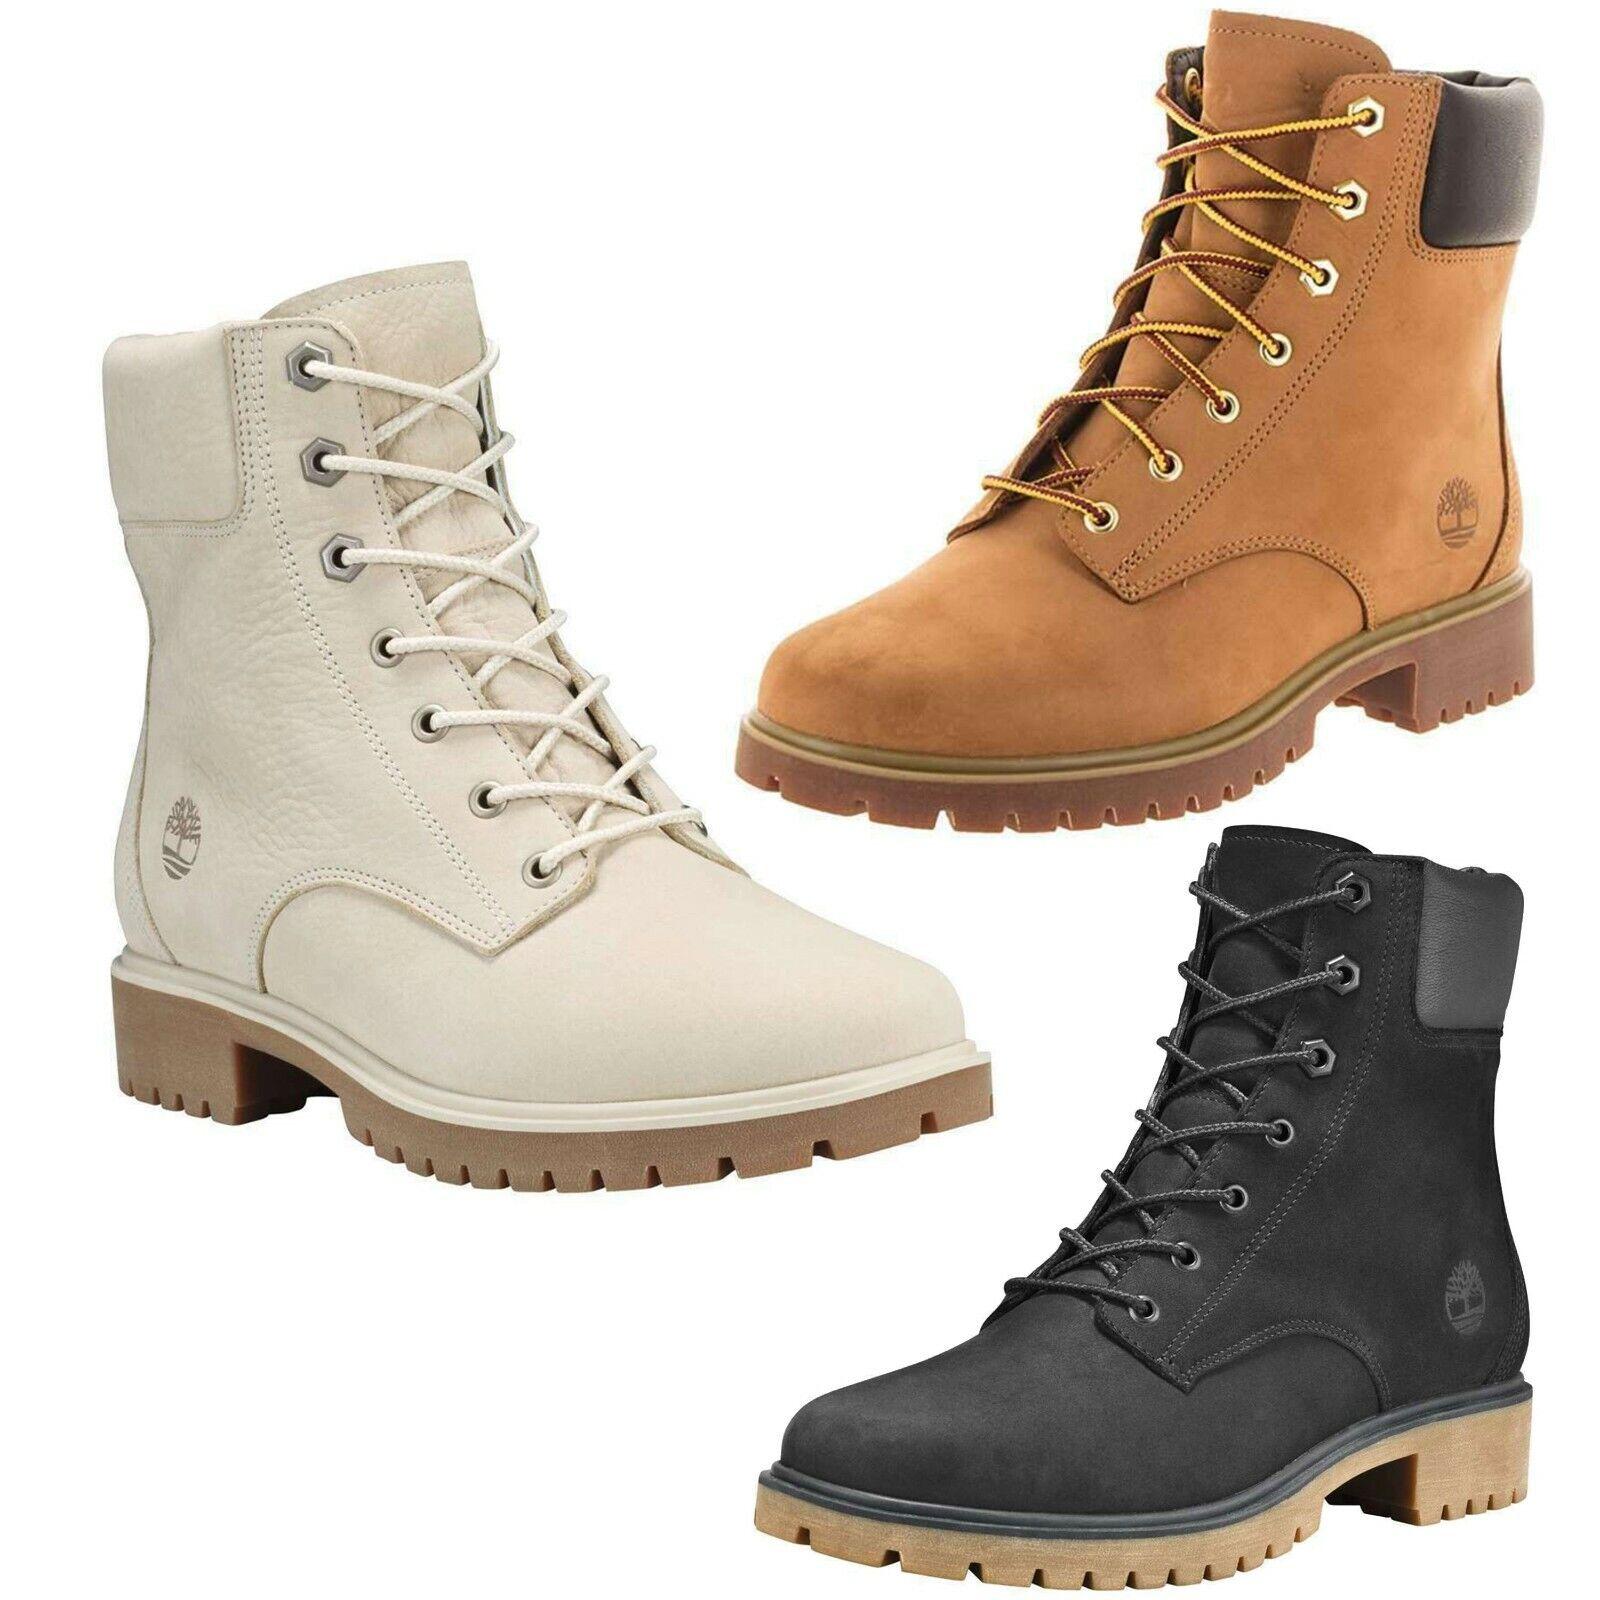 Timberland Women's Jayne 6 Inch Waterproof Rustproof Leather Winter Boots